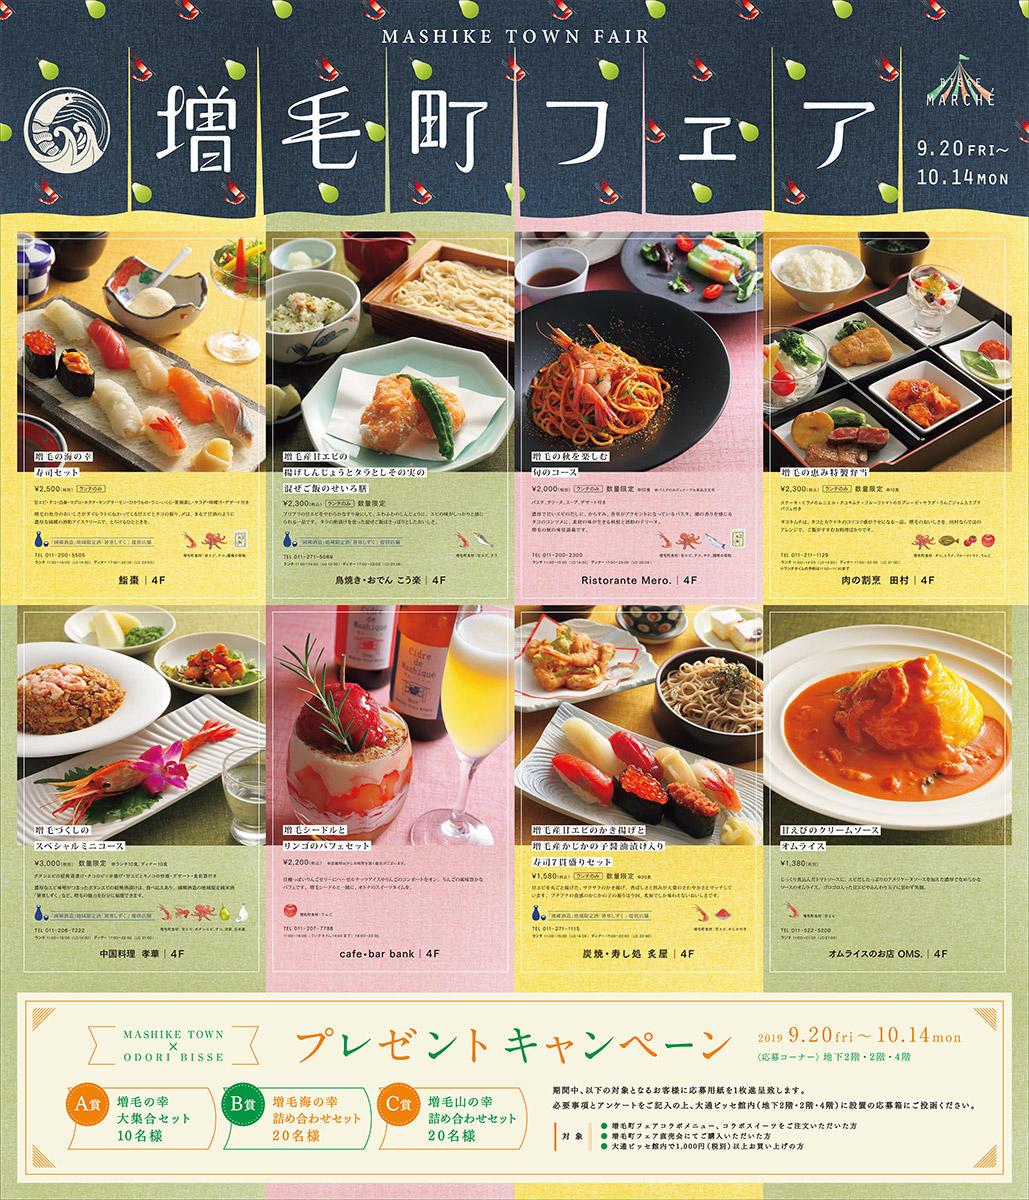 https://www.odori-bisse.com/info/news_190918_img1.jpg